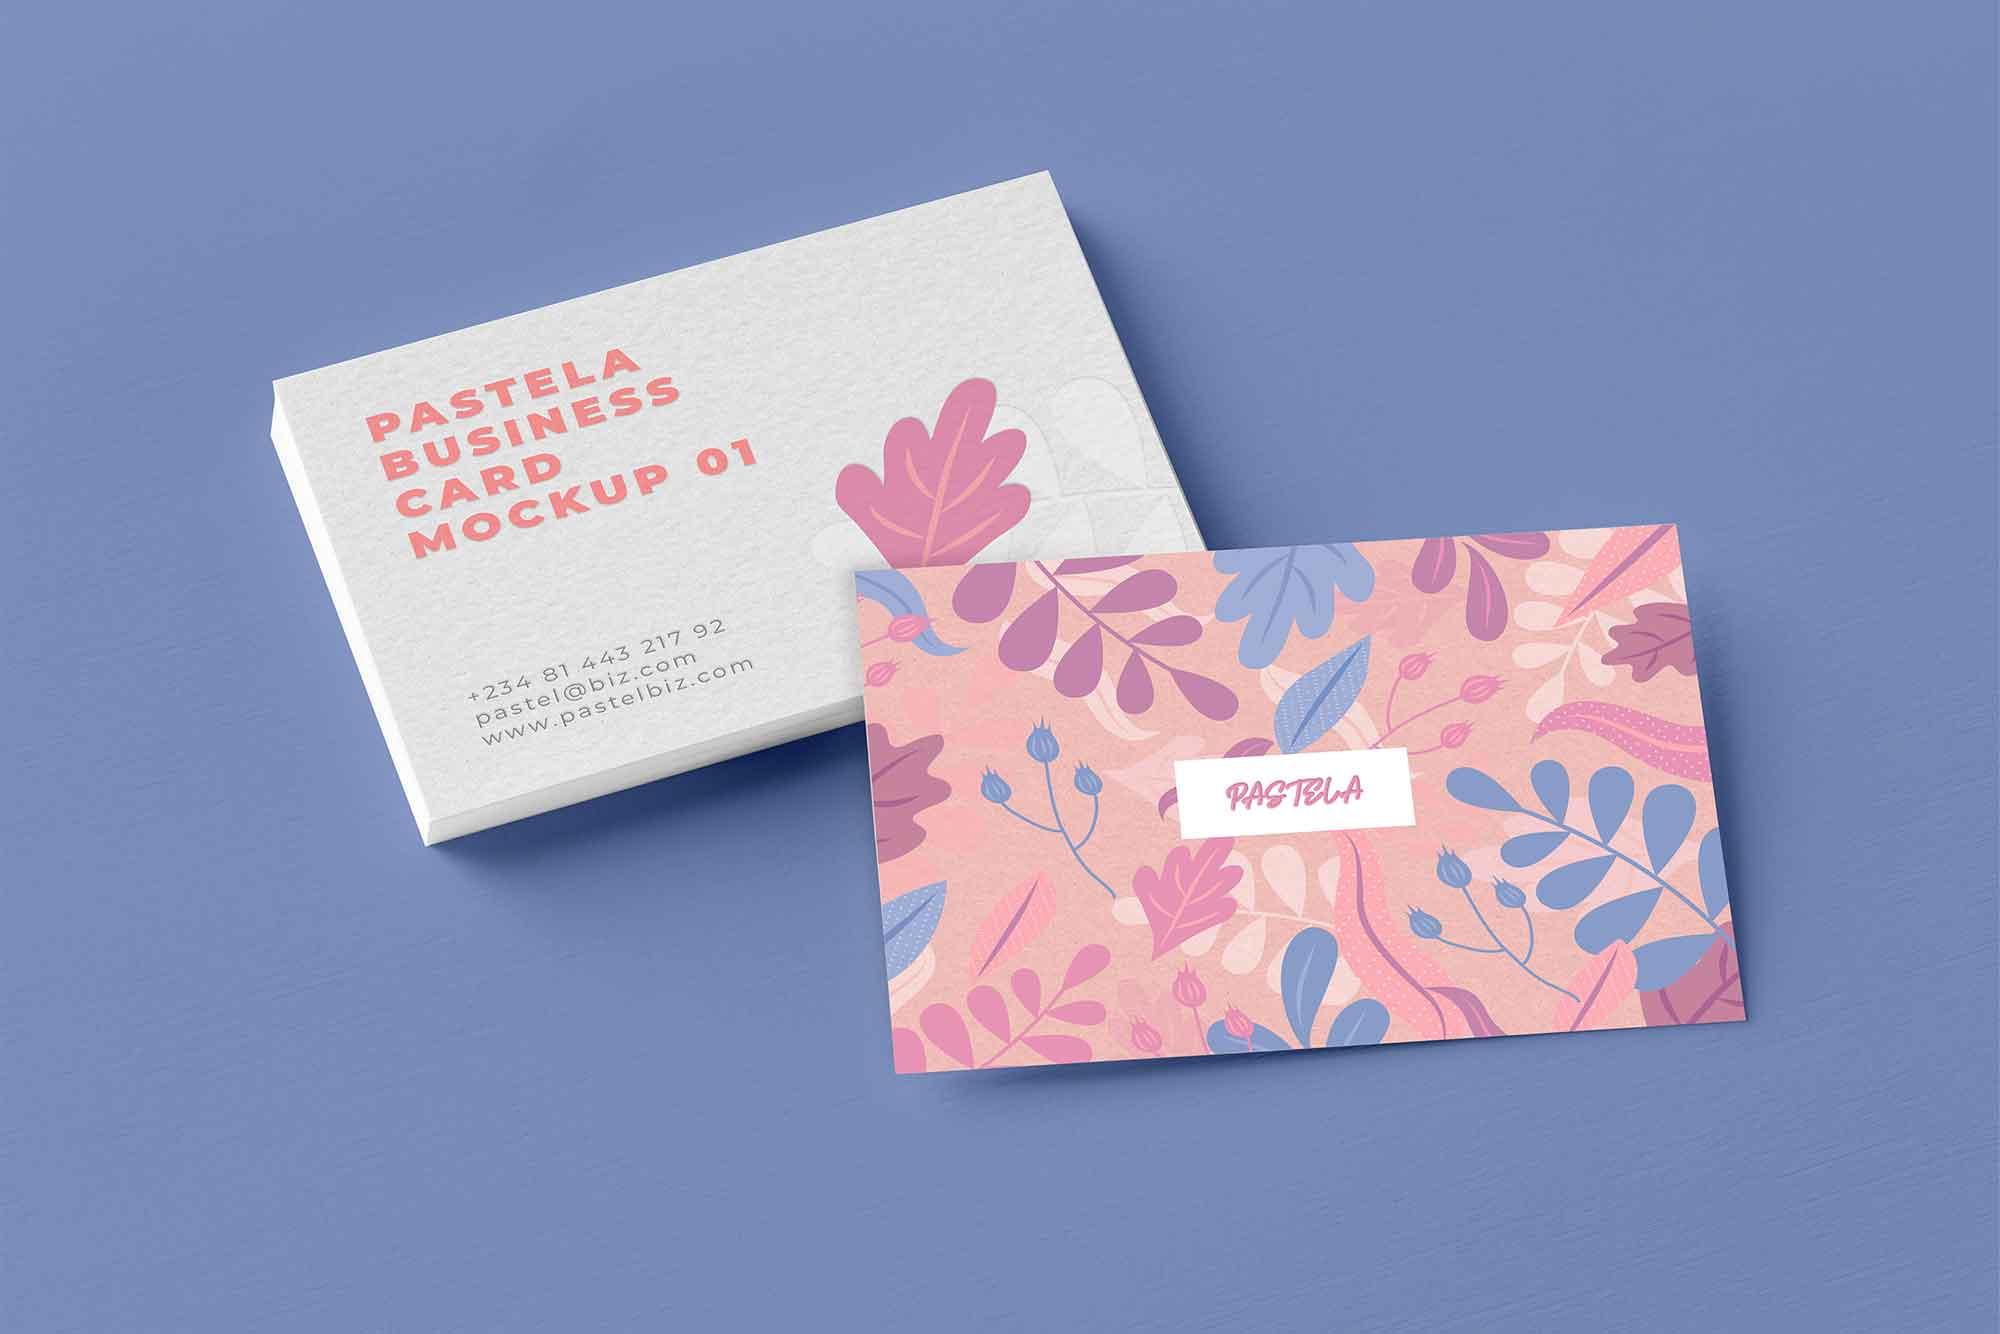 55 Business Card Psd Mockup Templates Decolore Net